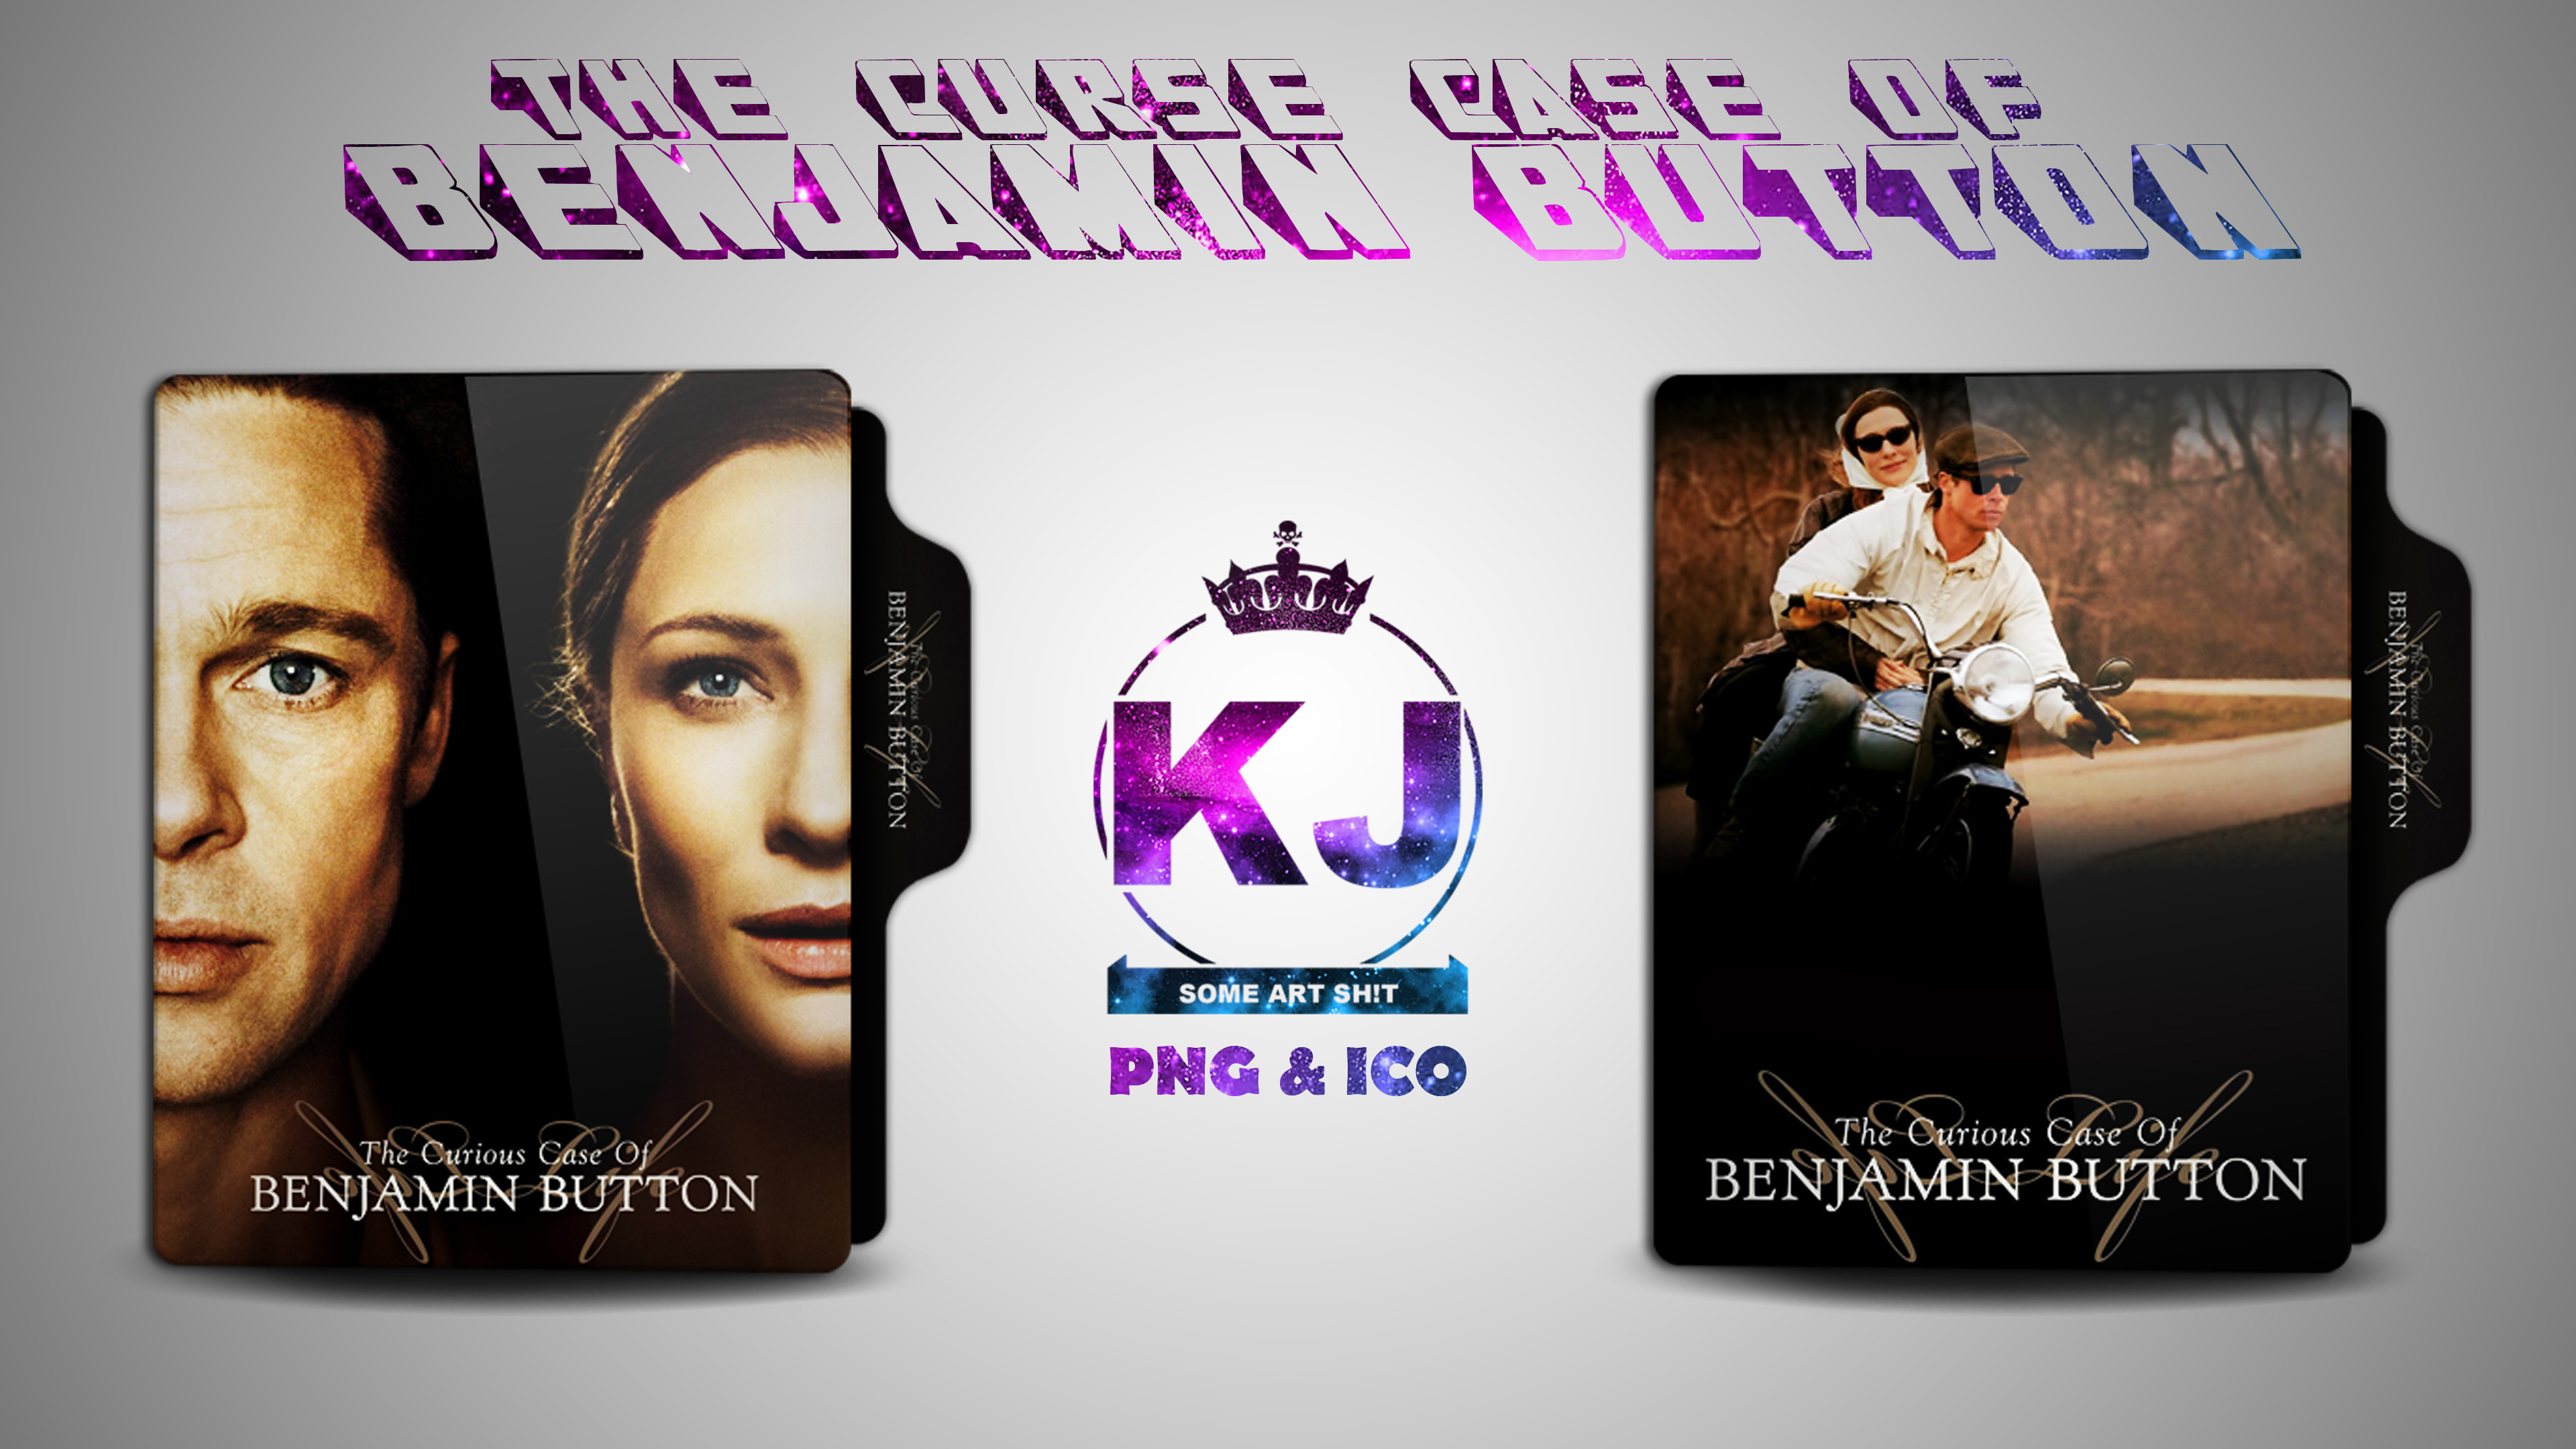 The Curious Case Of Benjamin Button 2008 Icon By Kingjoe93 On Deviantart